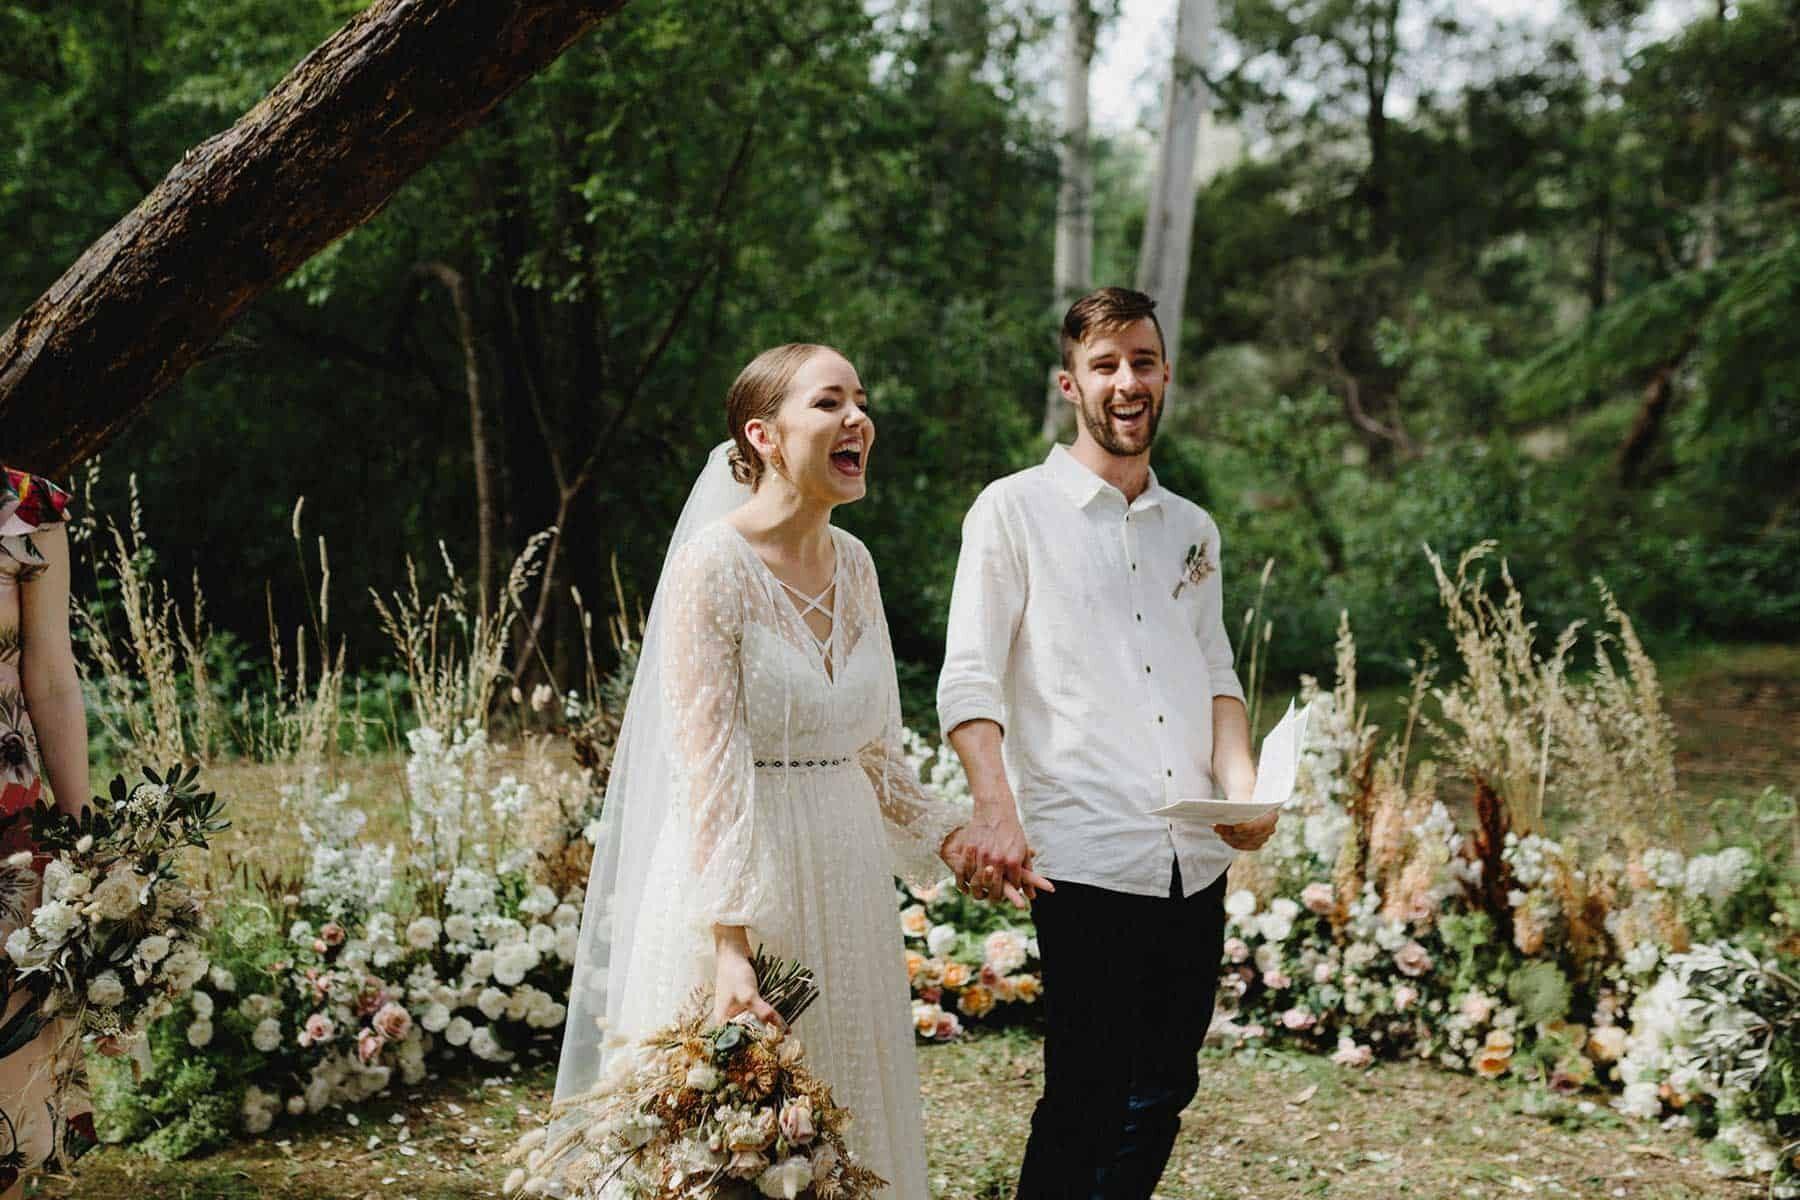 wedding ceremony floral ground arch